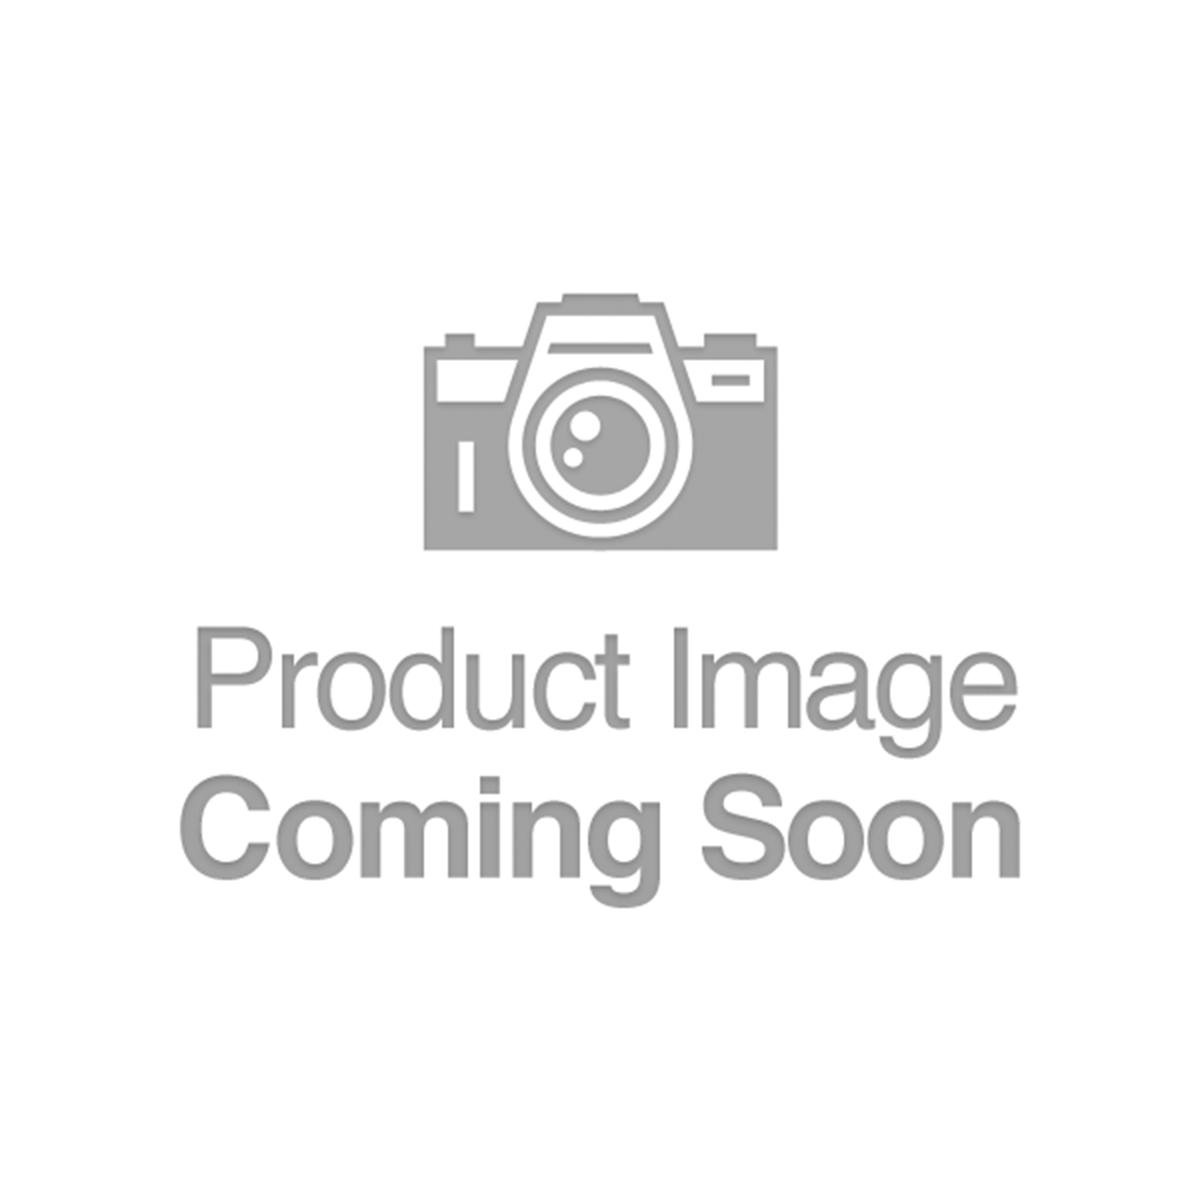 C Bechtler $2.50 Circle Bechtler (N. Carolina/Georgia) PCGS MS63 CAC